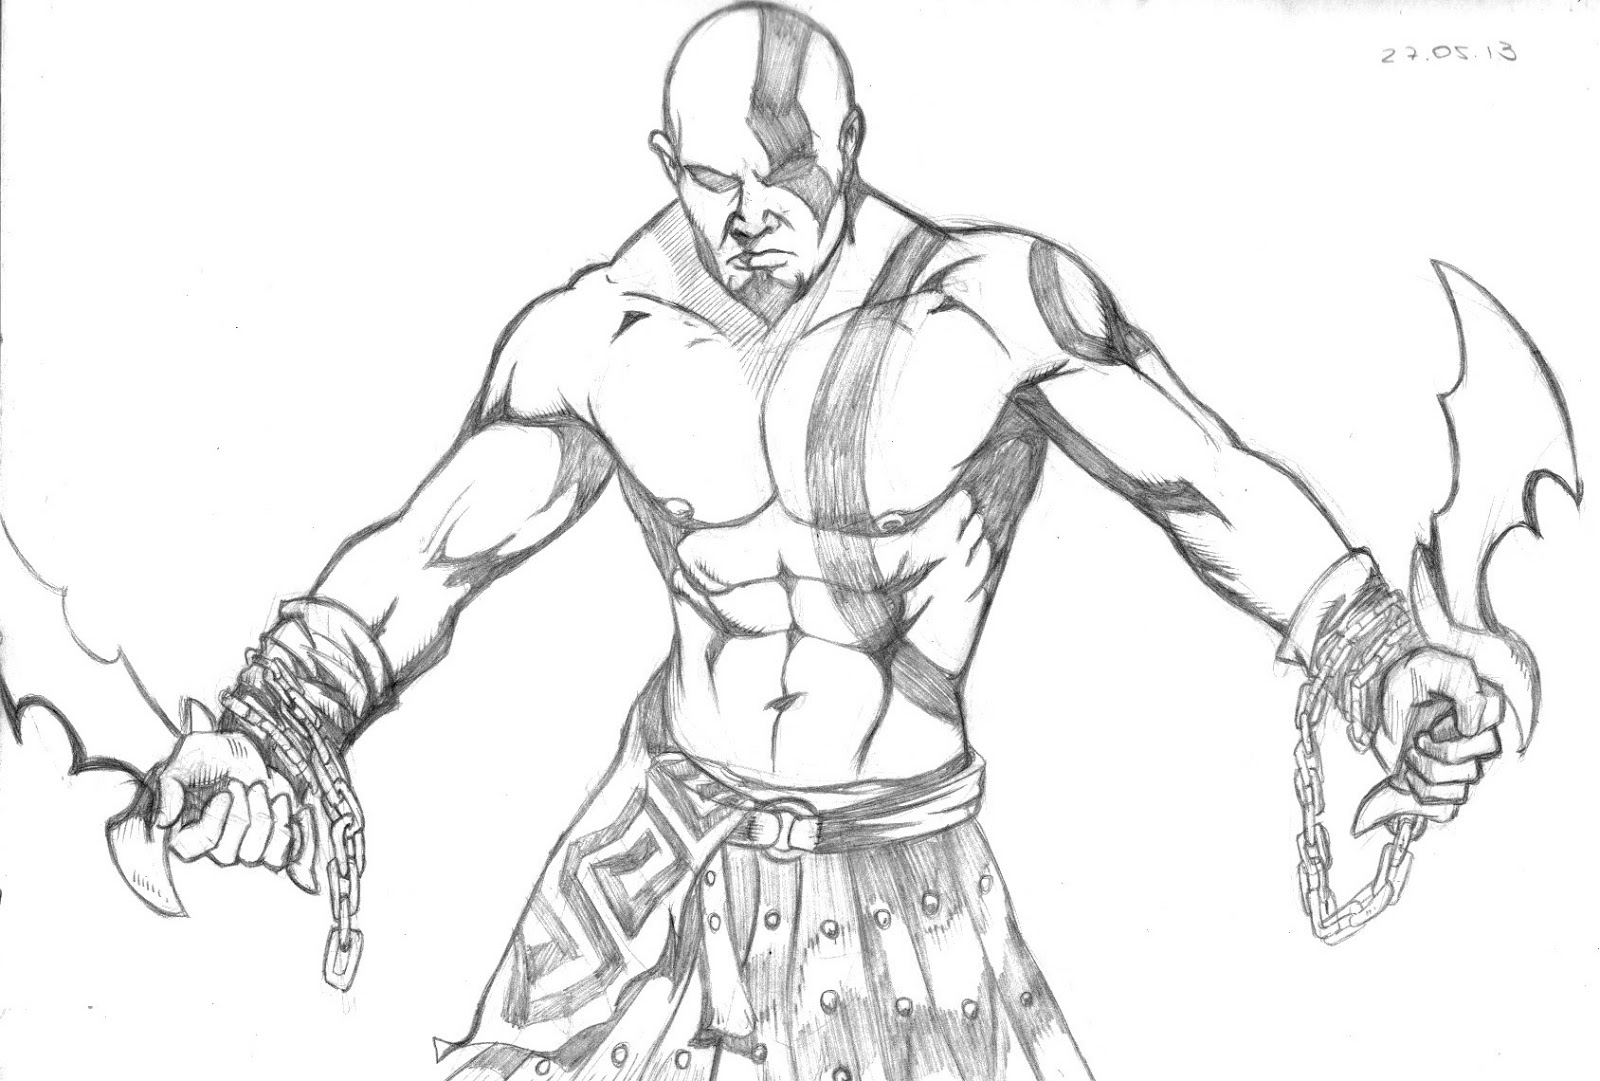 Kratos+by+Sandro+Costa.JPG